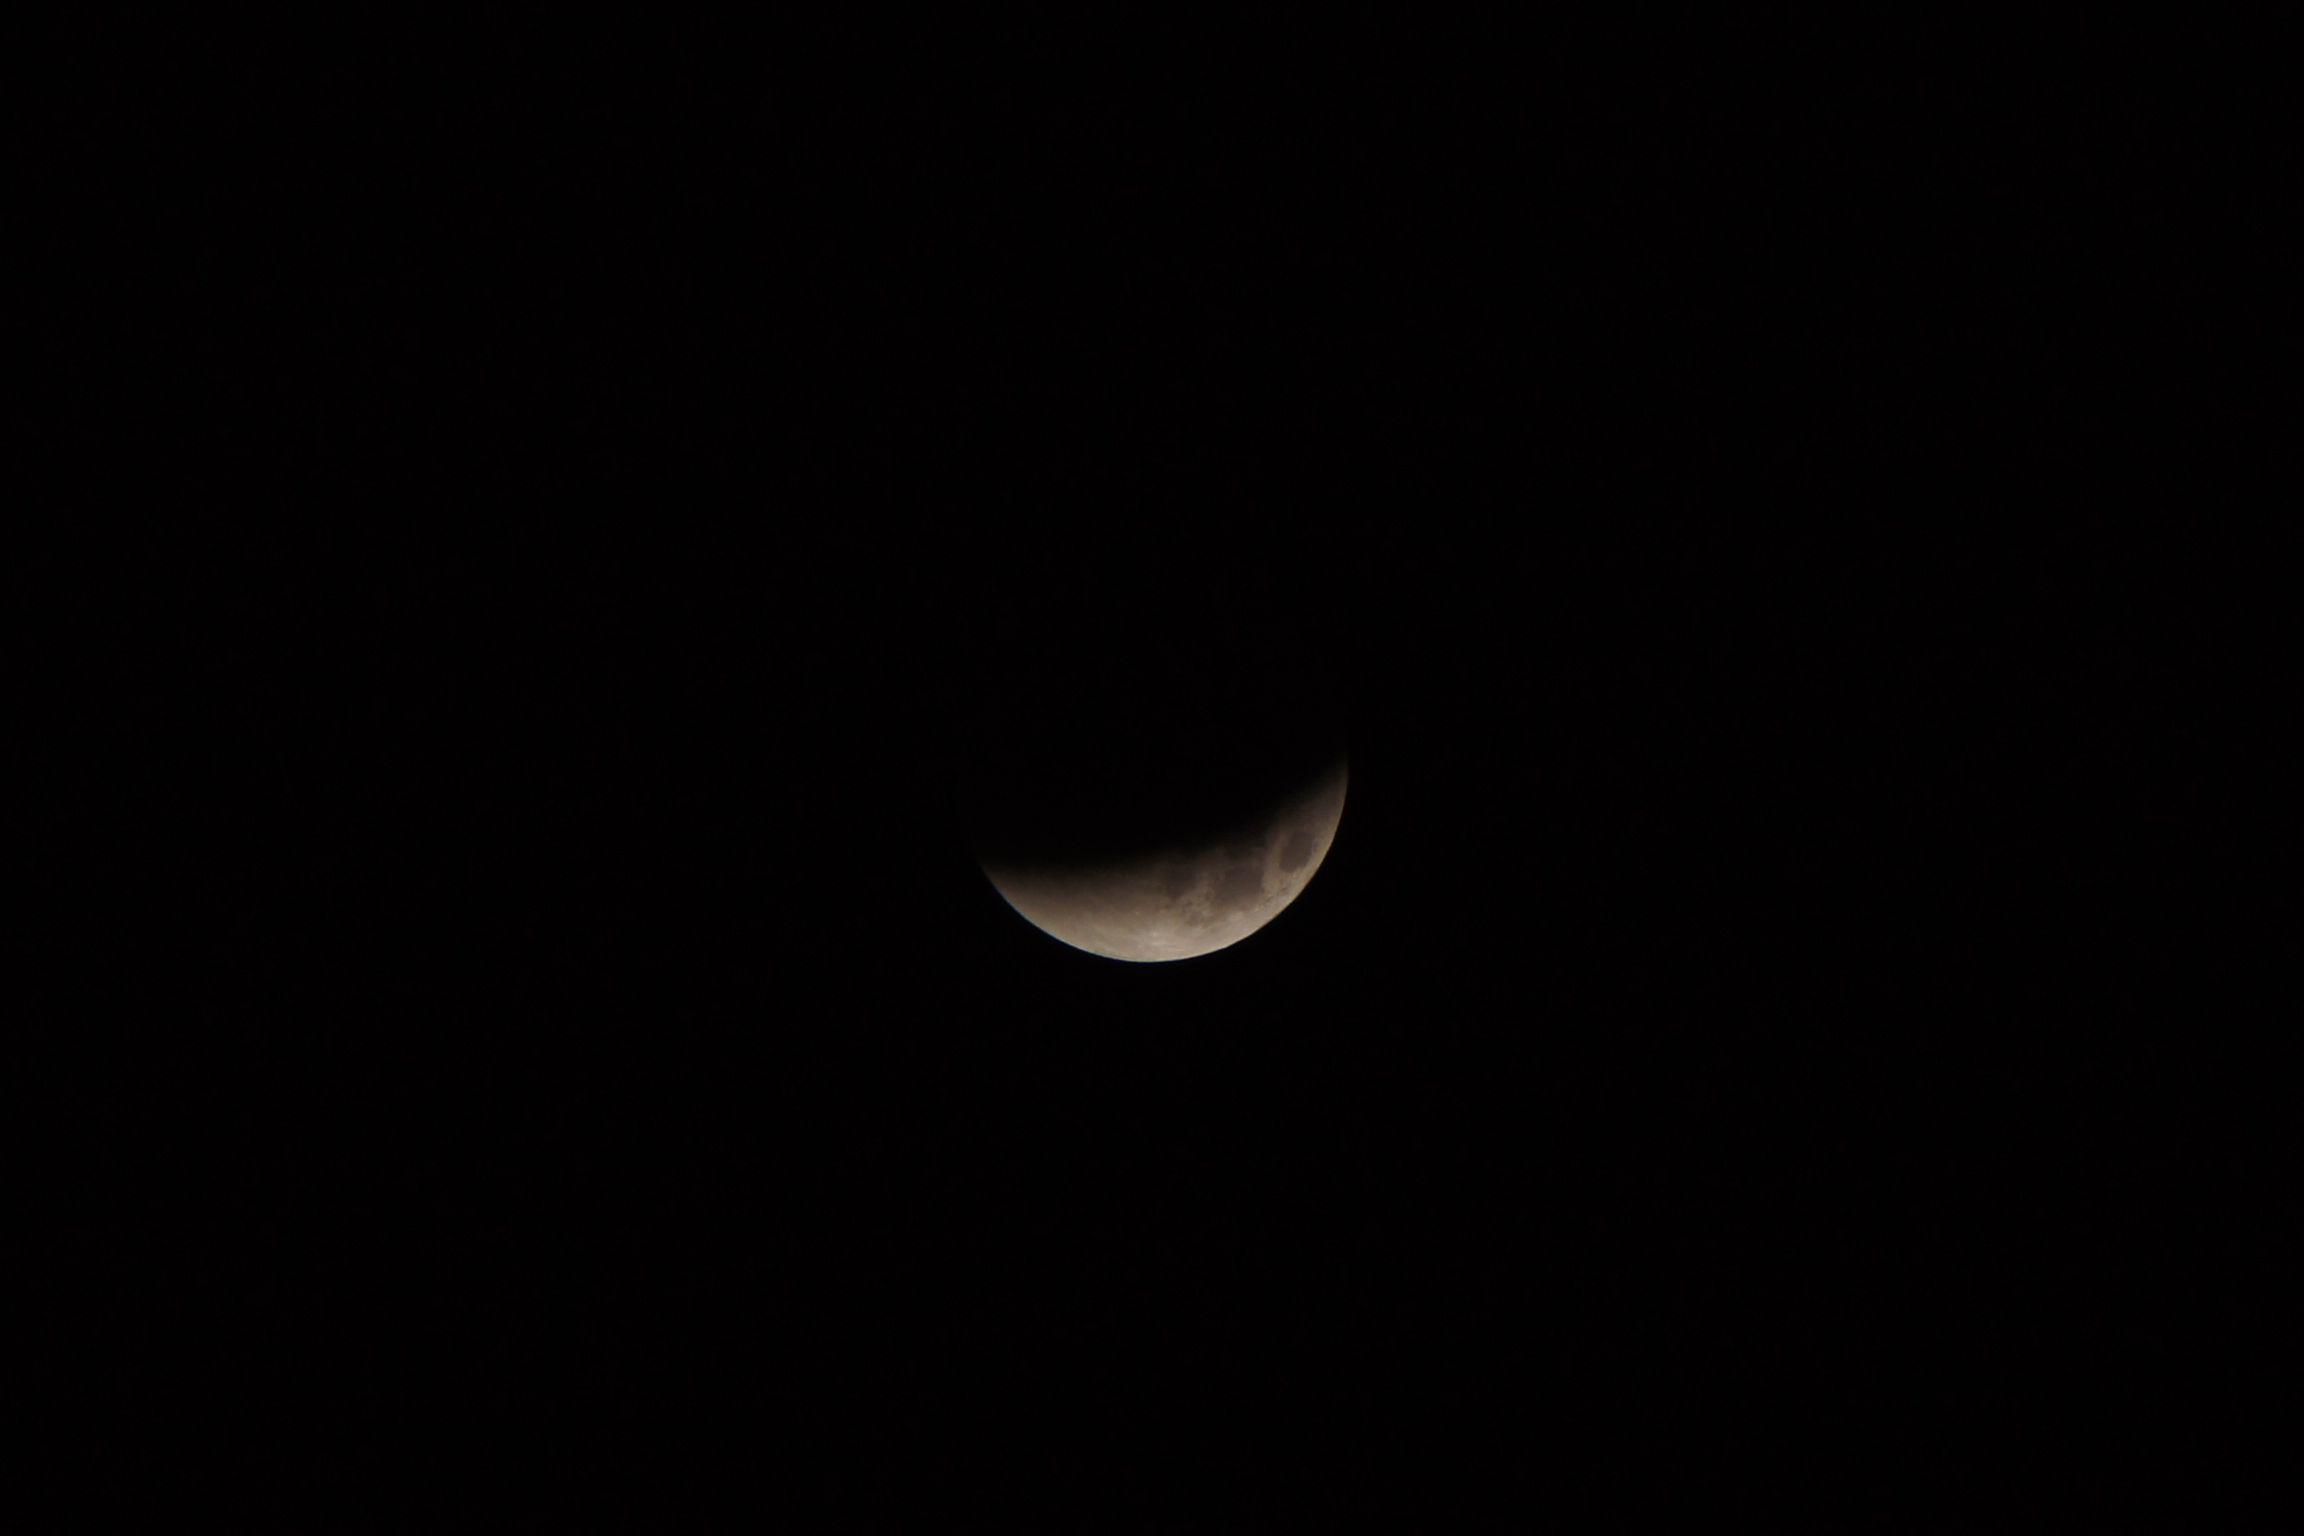 27 septembre lune